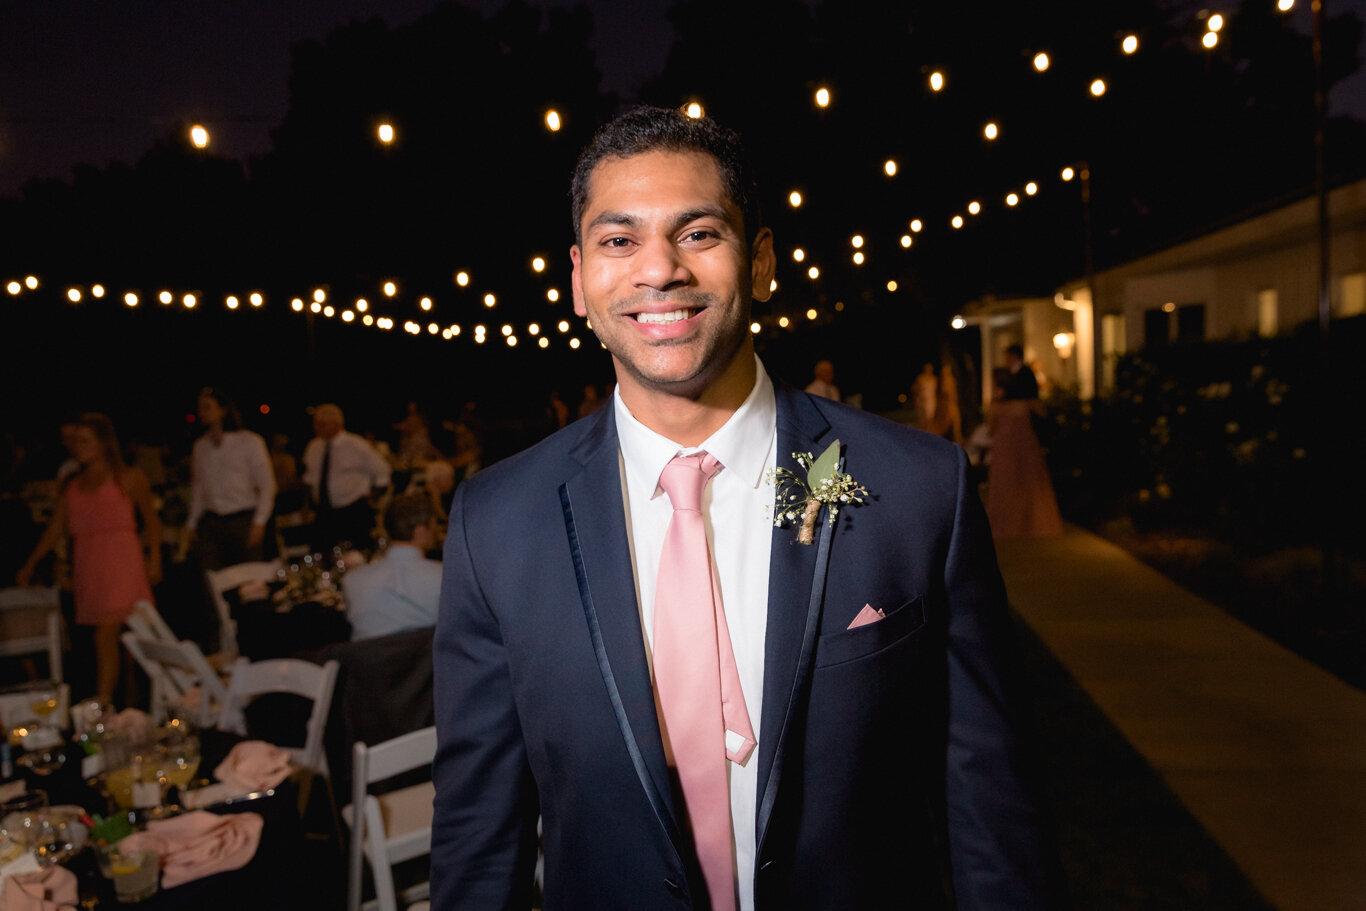 2019.08.24_Emily-Ashir-Wedding-at-the-Maples-6393.jpg